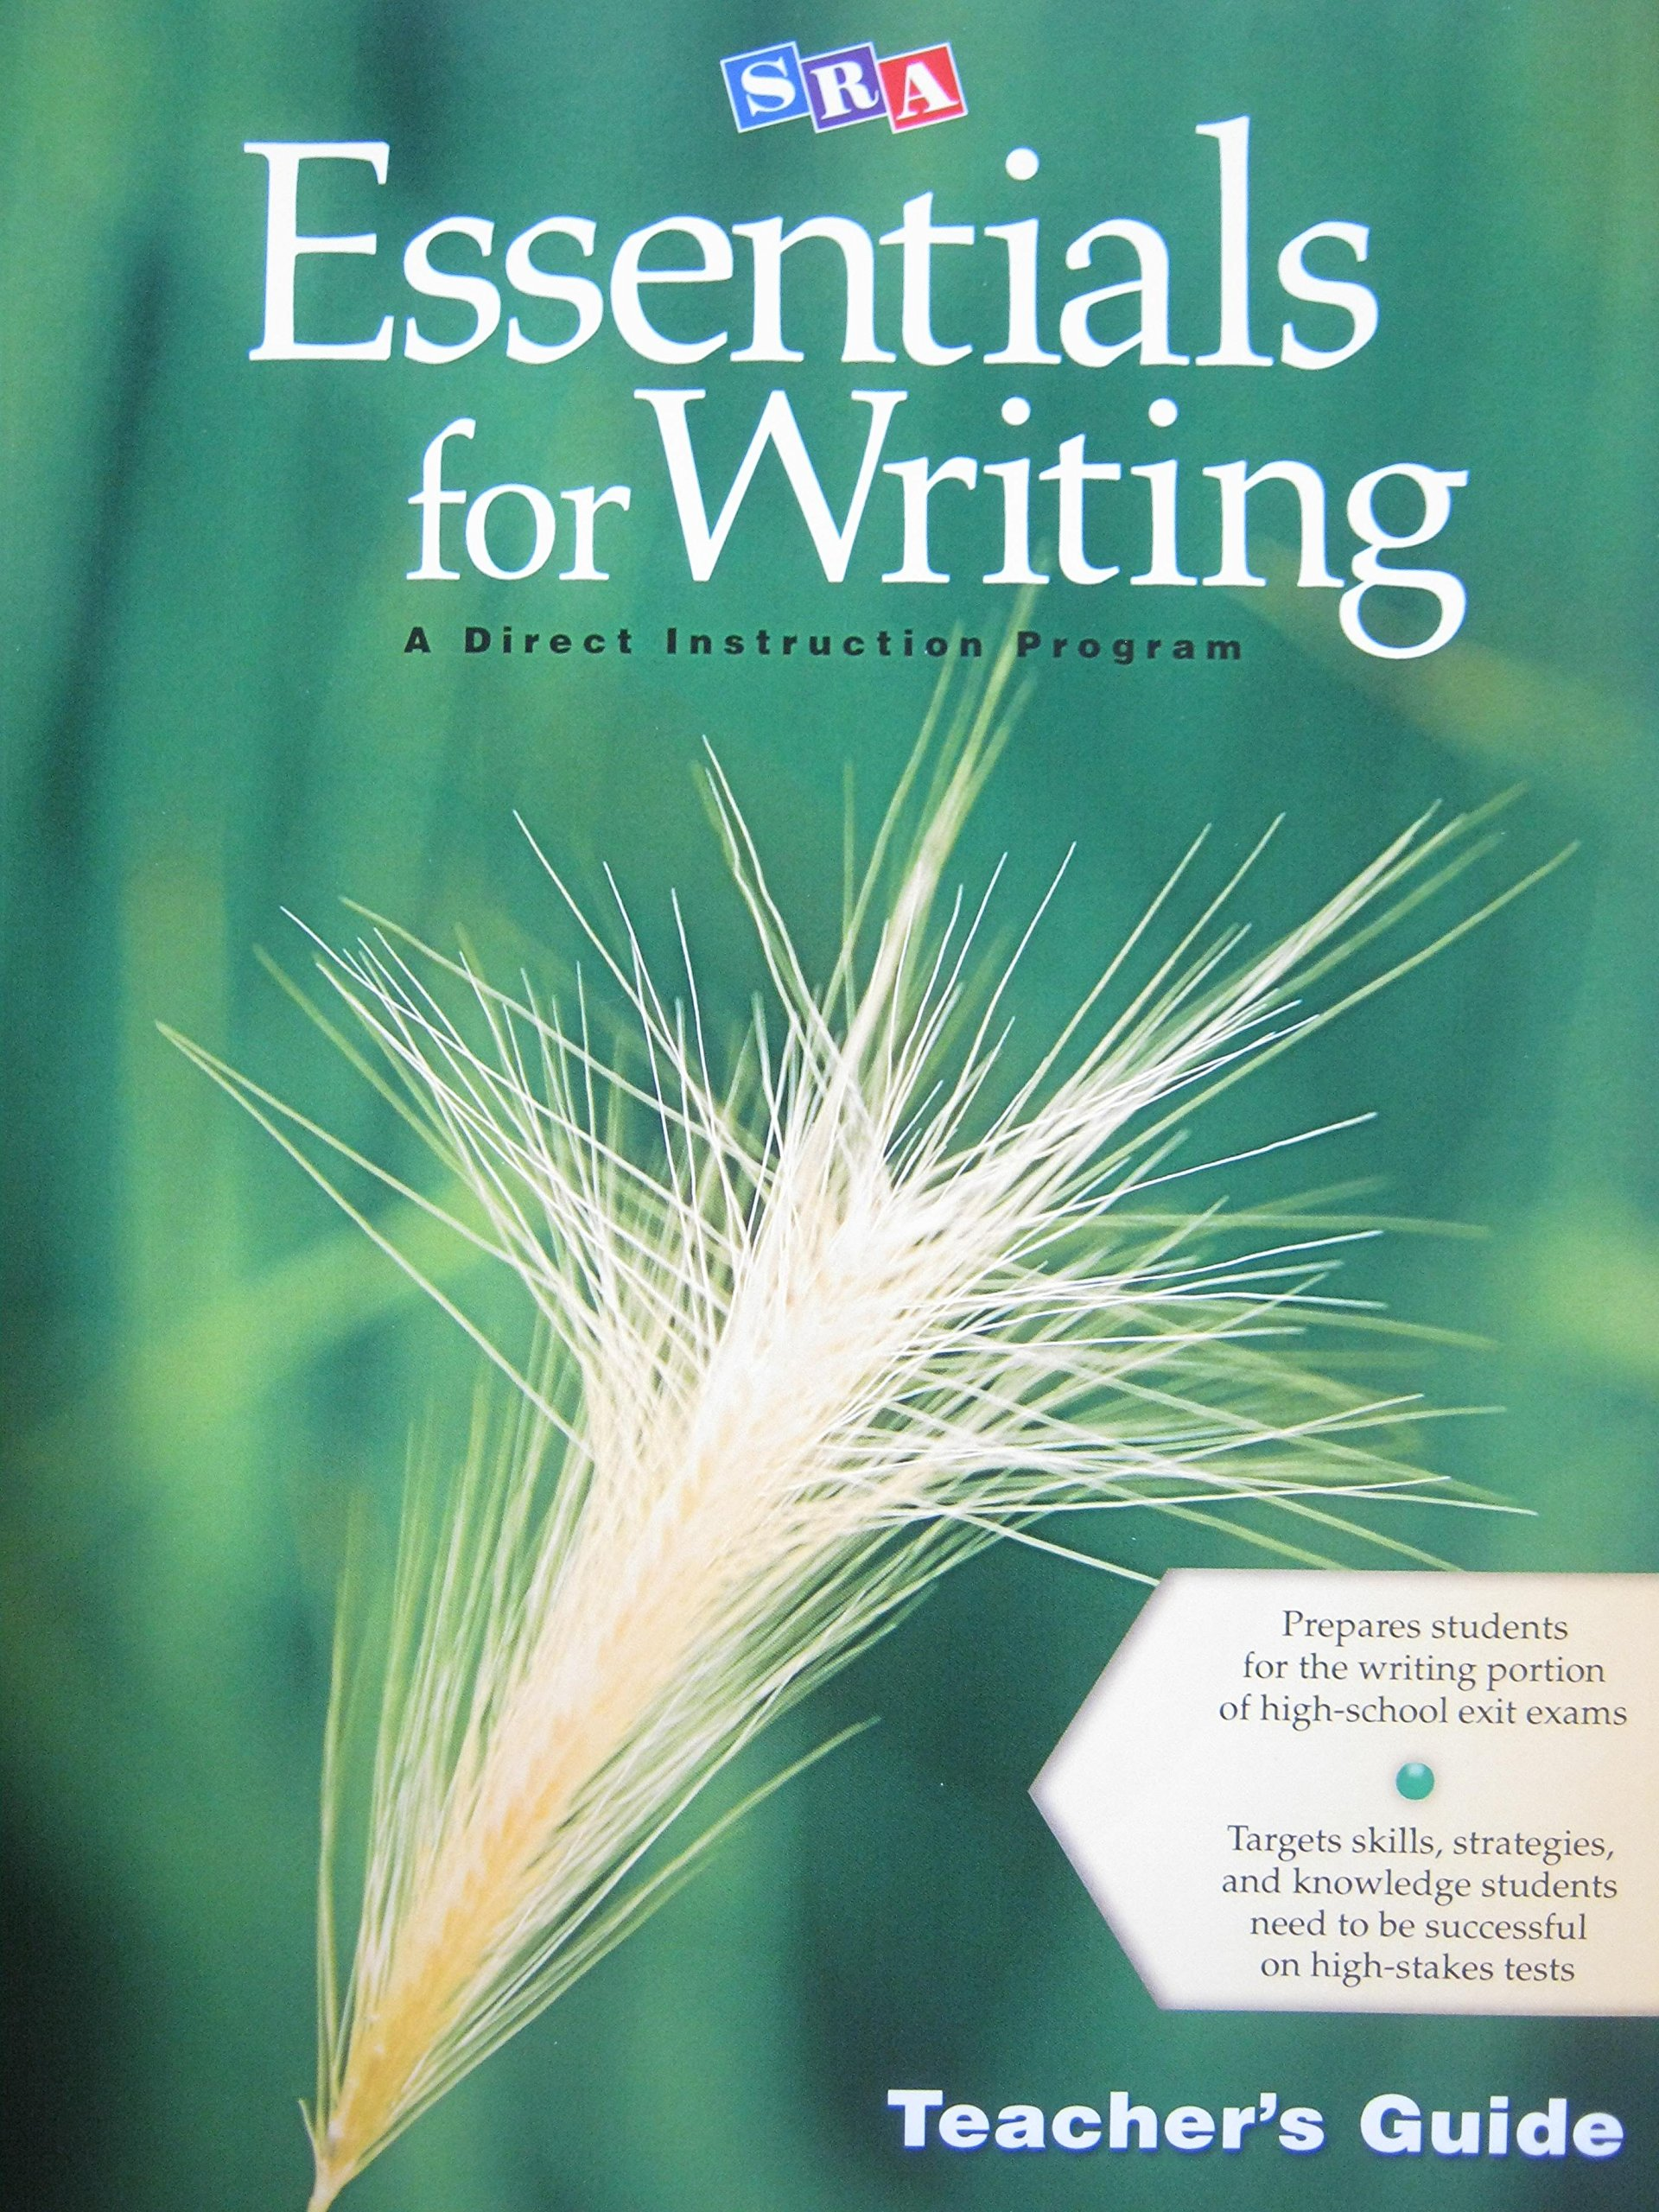 Sra Essentials For Writing Teachers Guide Bonnie Grossen Siegfried